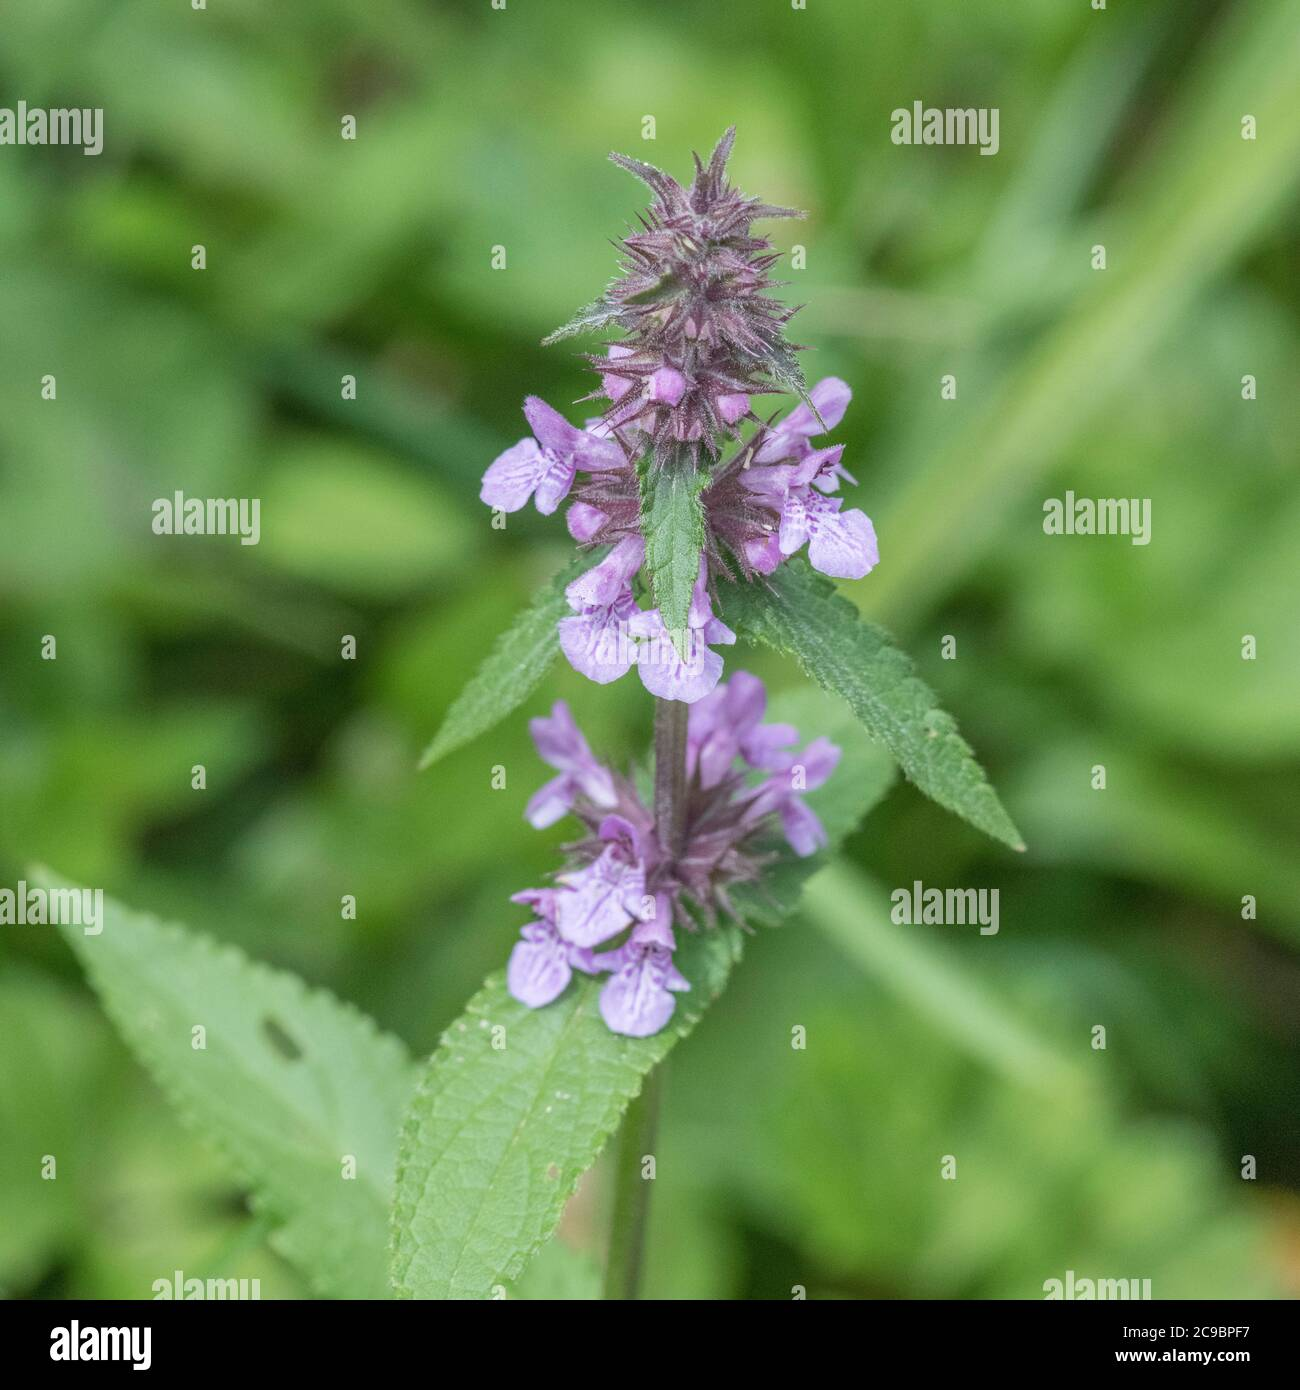 Leaves and purple flowers of Marsh Woundwort / Stachys palustris seen growing in damp field corner. Former medicinal plant used in herbal remedies. Stock Photo